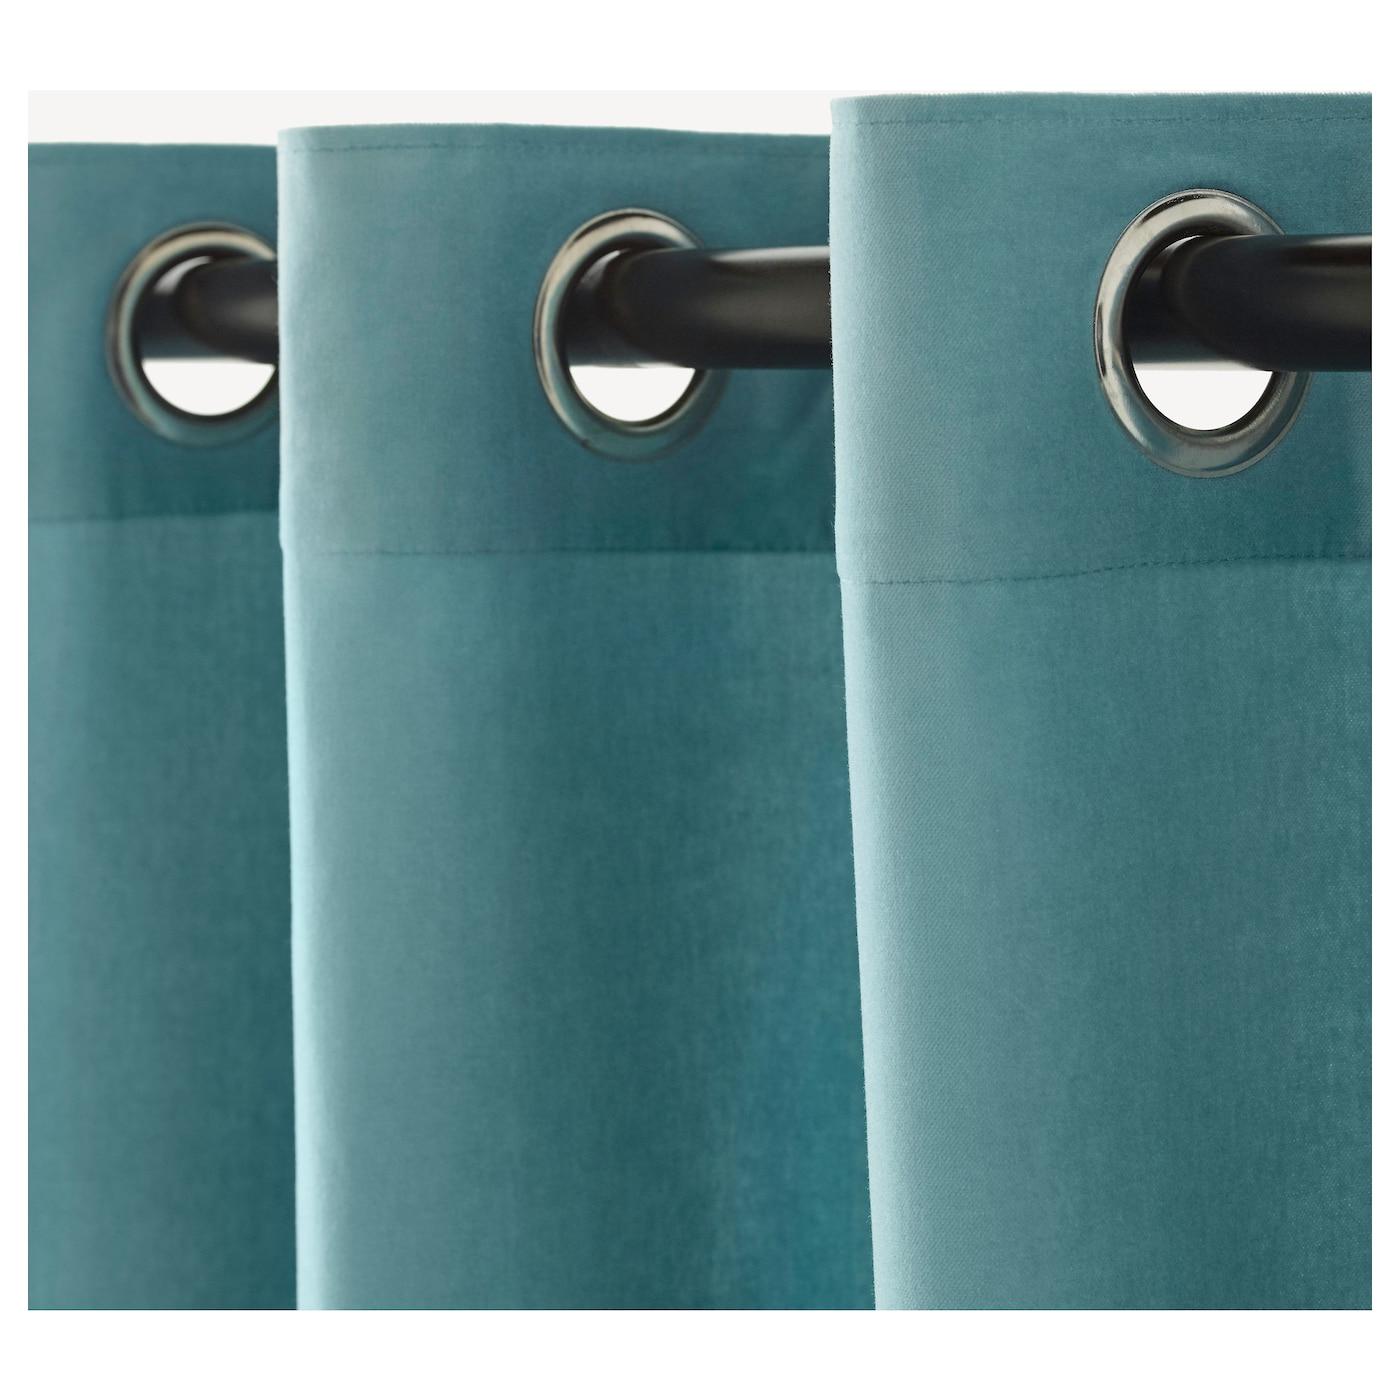 SANELA Curtains, 1 pair Light turquoise 140x250 cm - IKEA for Turquoise Curtains Ikea  56mzq